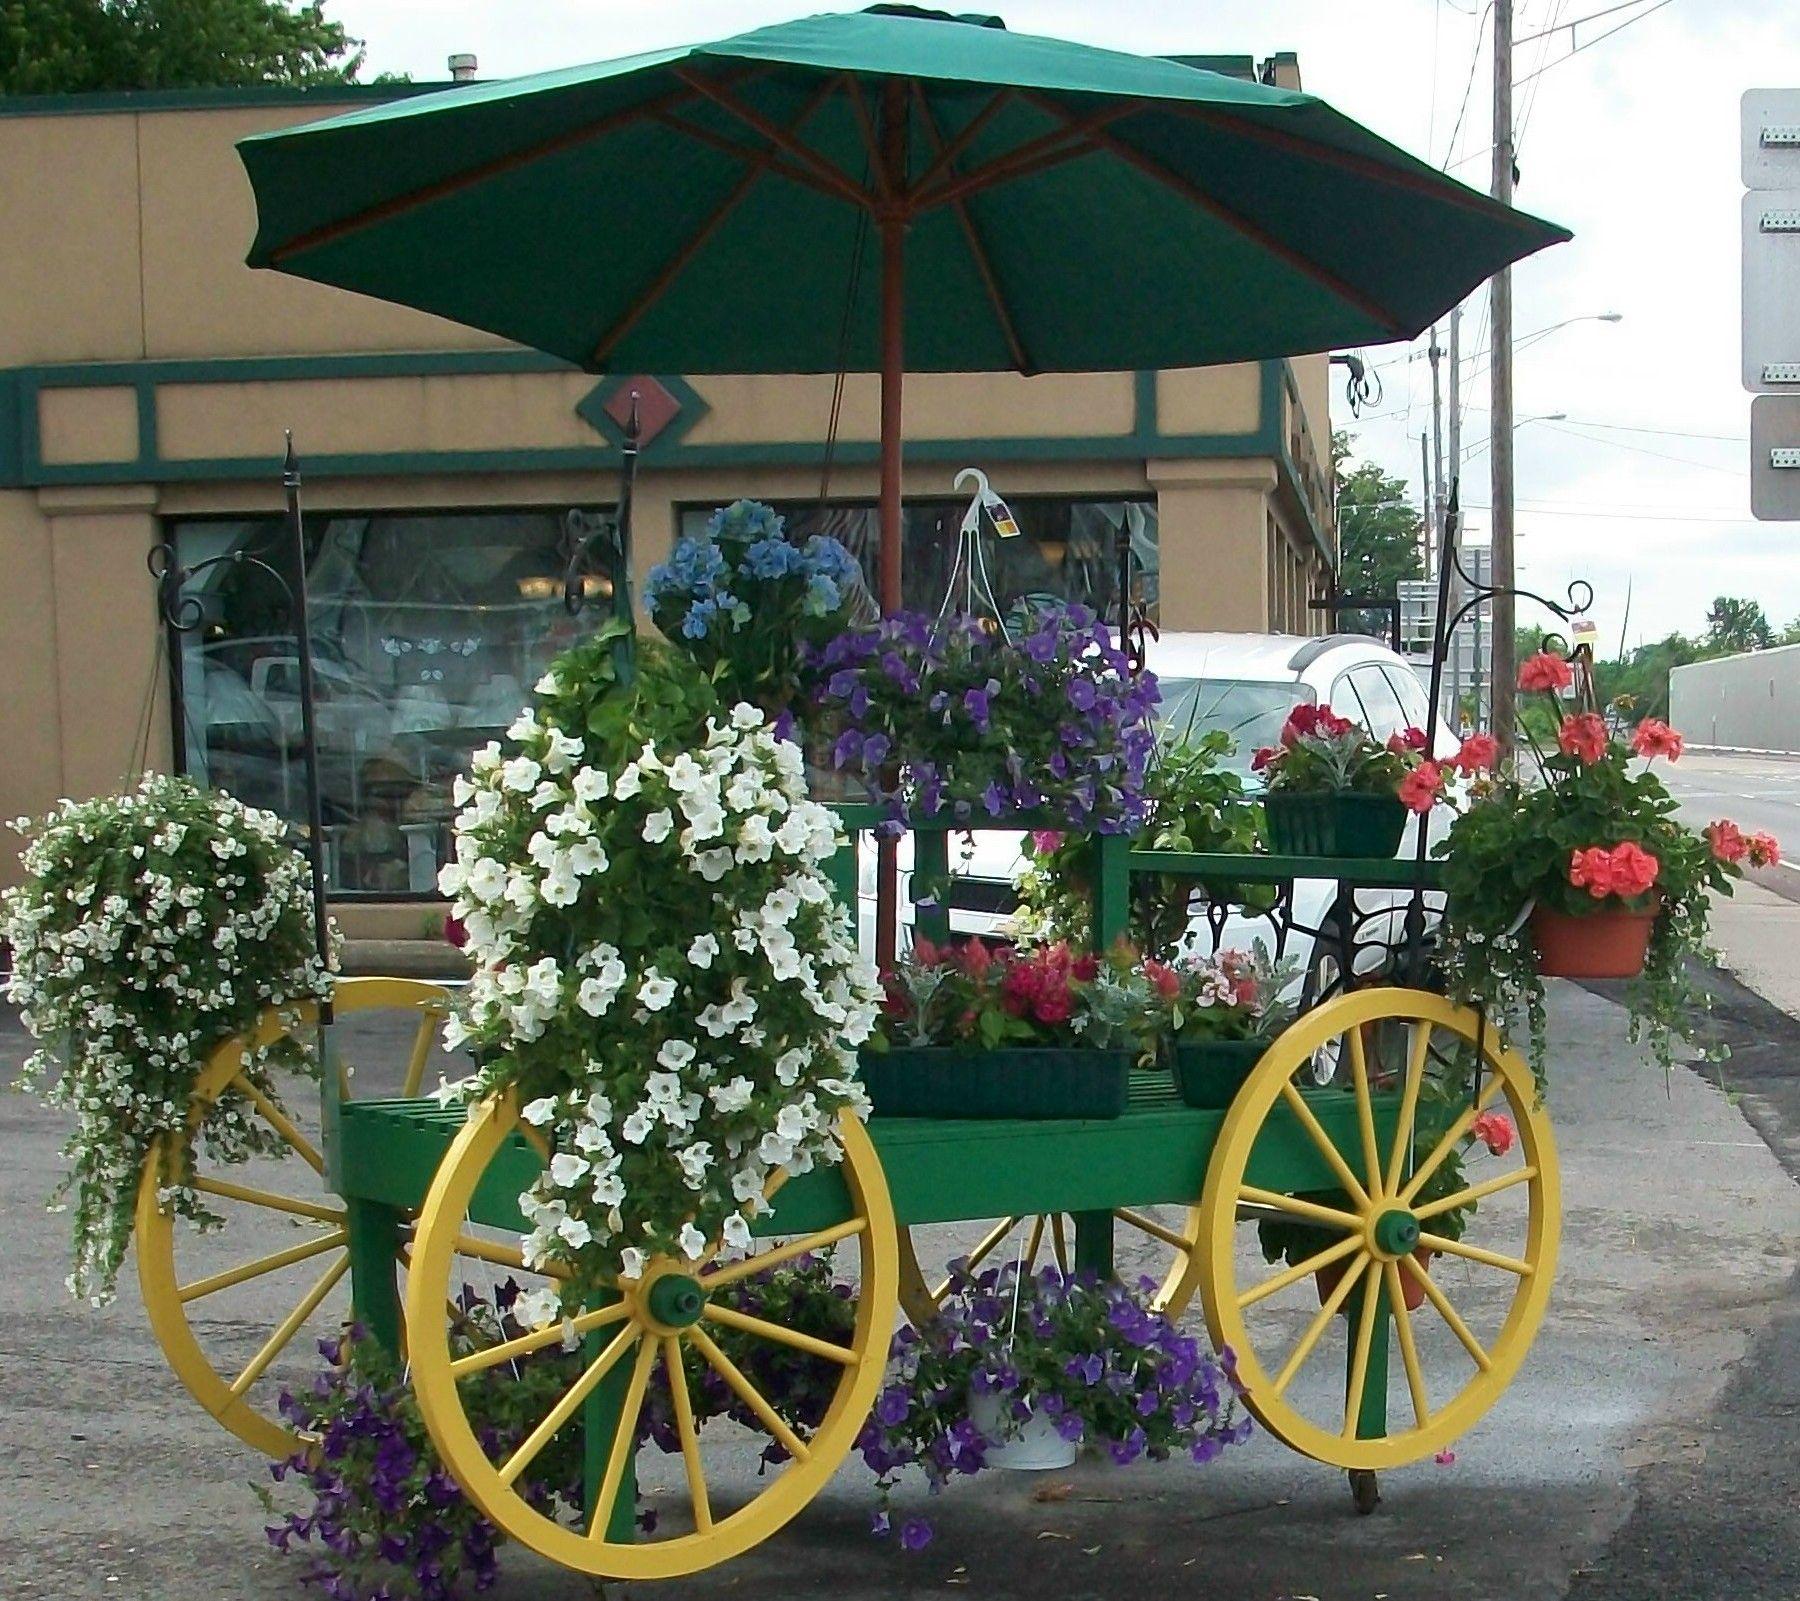 Flower Cart in front of the shop. Flower cart, Flower